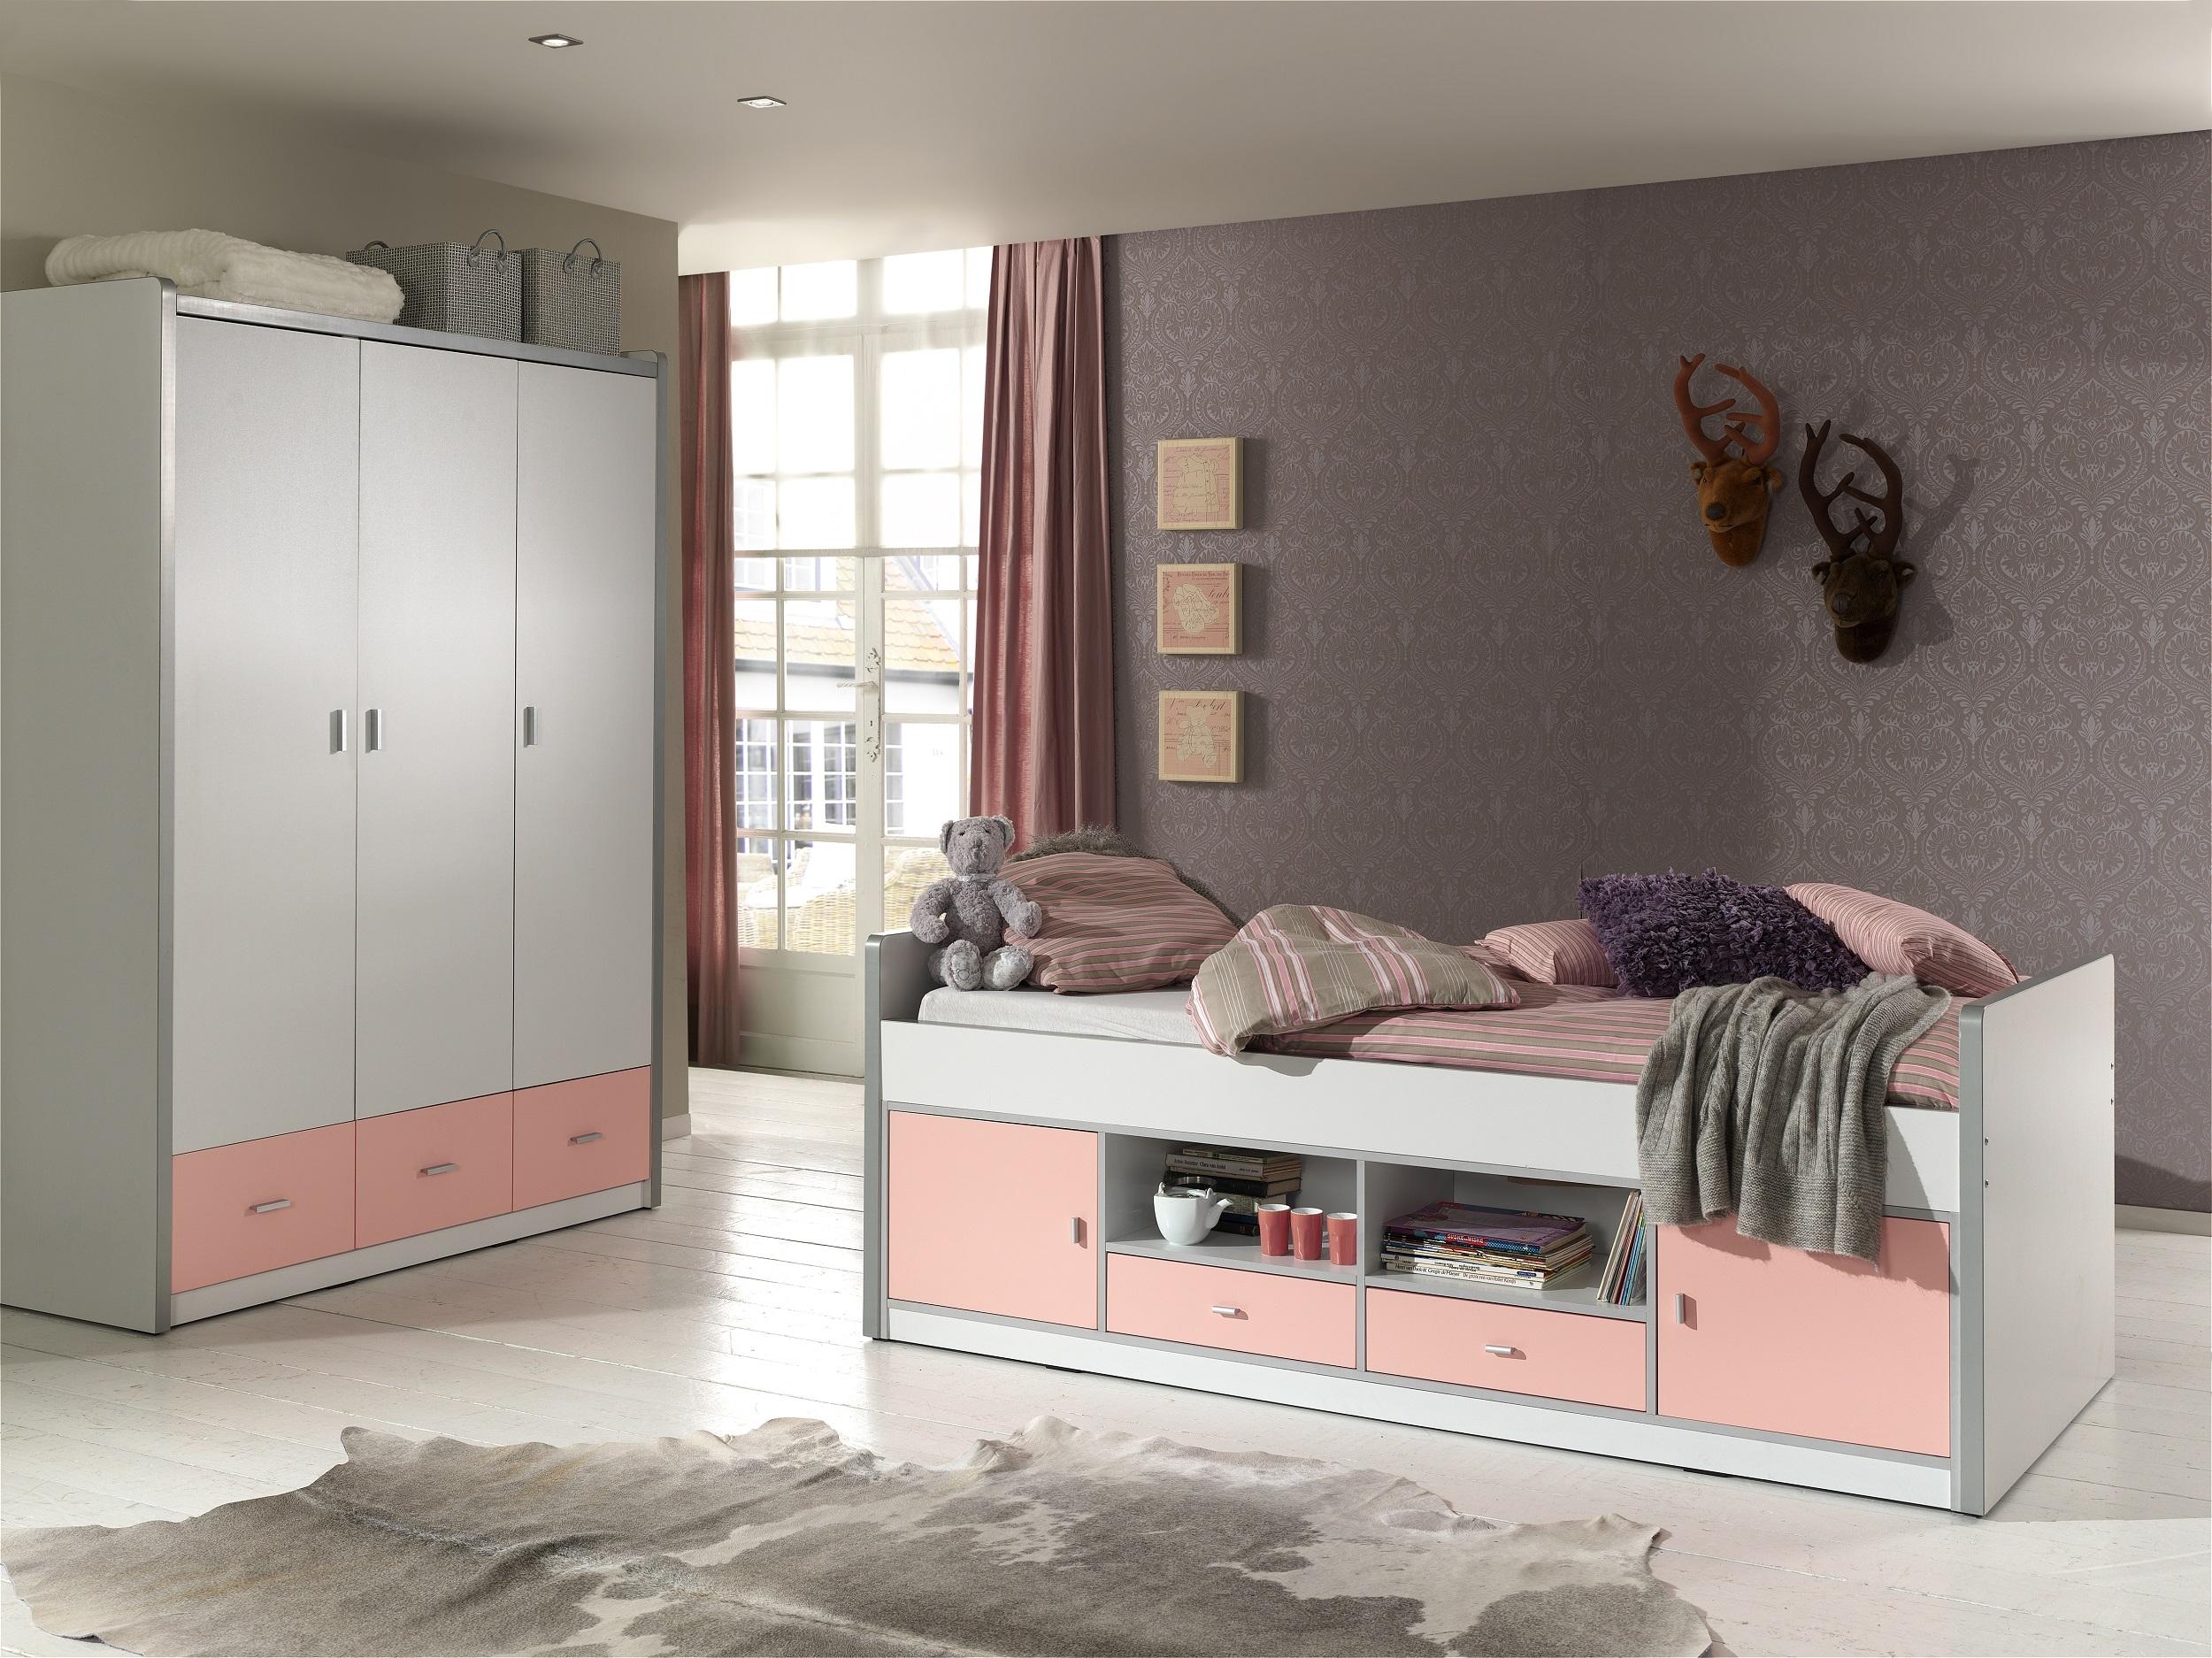 Set Mobila dormitor din pal, pentru copii 2 piese Bonny Capitan Alb / Roz, 200 x 90 cm imagine